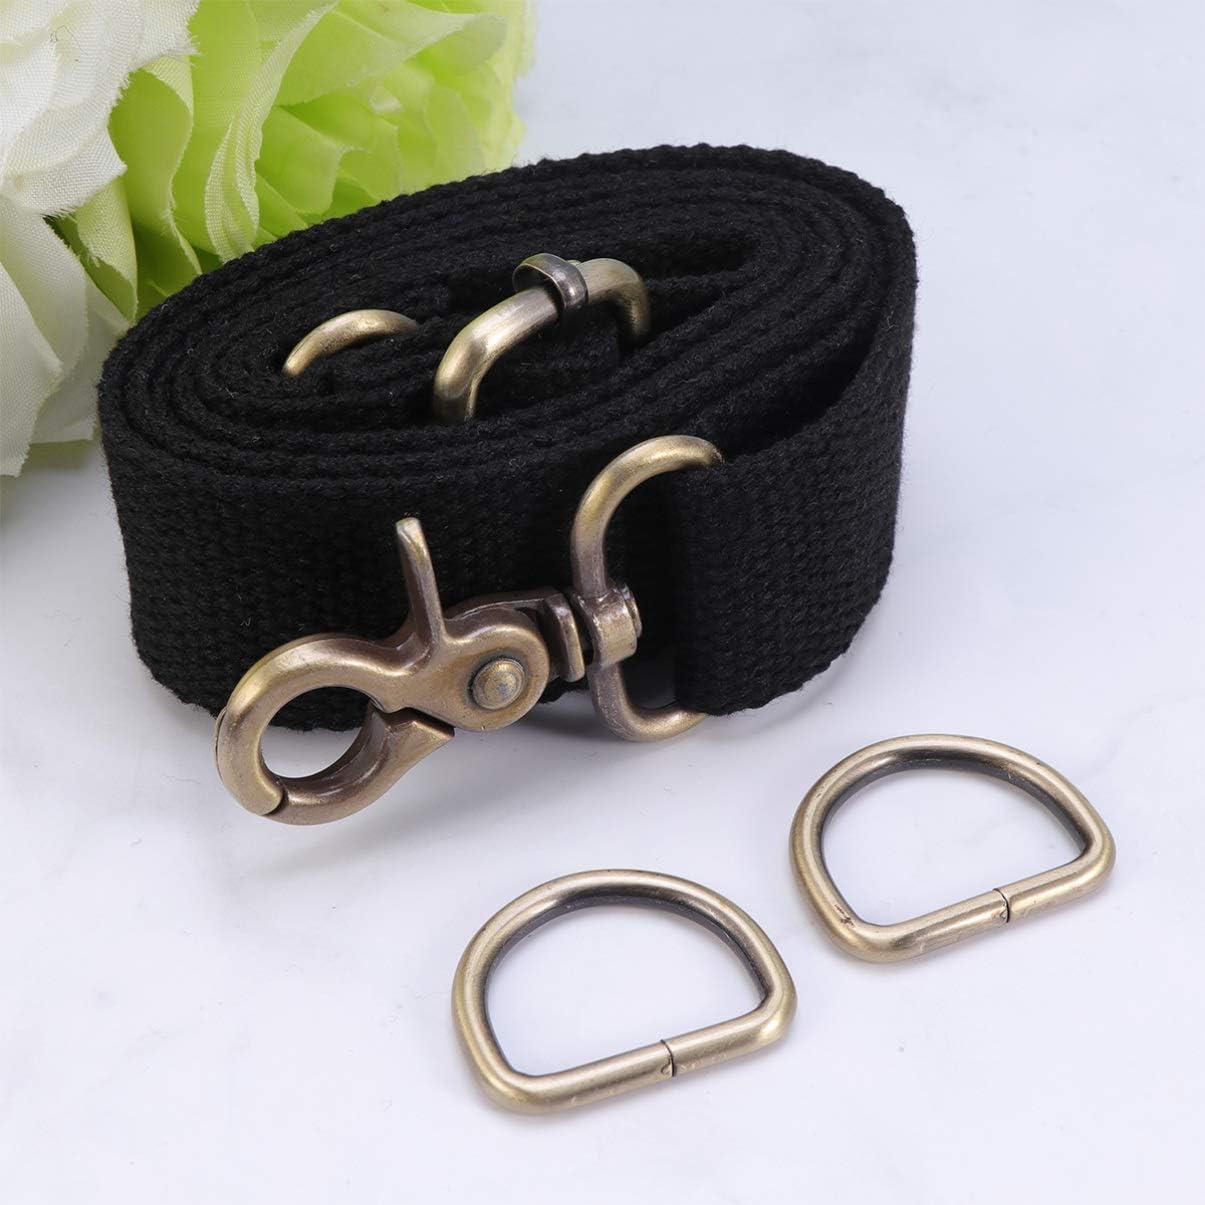 SUPVOX 1PC 3.2cm Shoulder Strap Adjustable Canvas Replacement Belt Crossbody Handbag Purse Strap Black